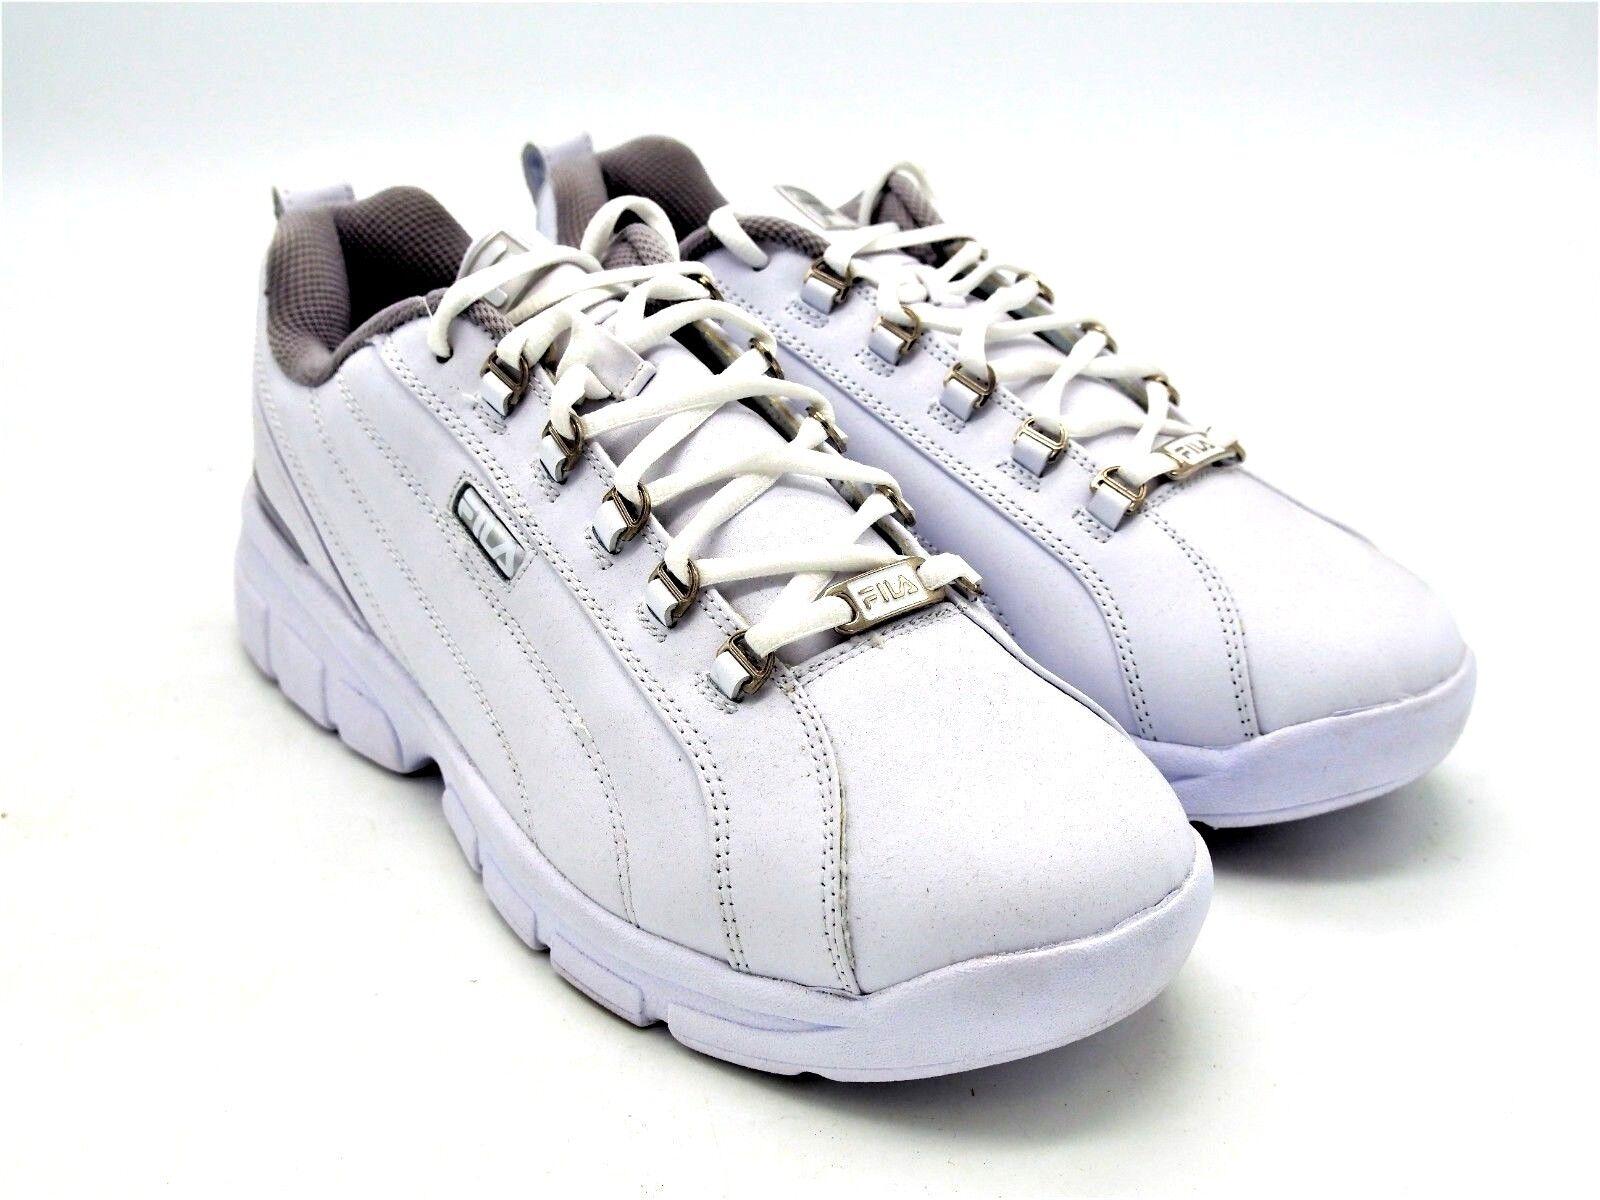 D1614 New Women's Fila Cool Max Memory Foam White Running shoes 11 M